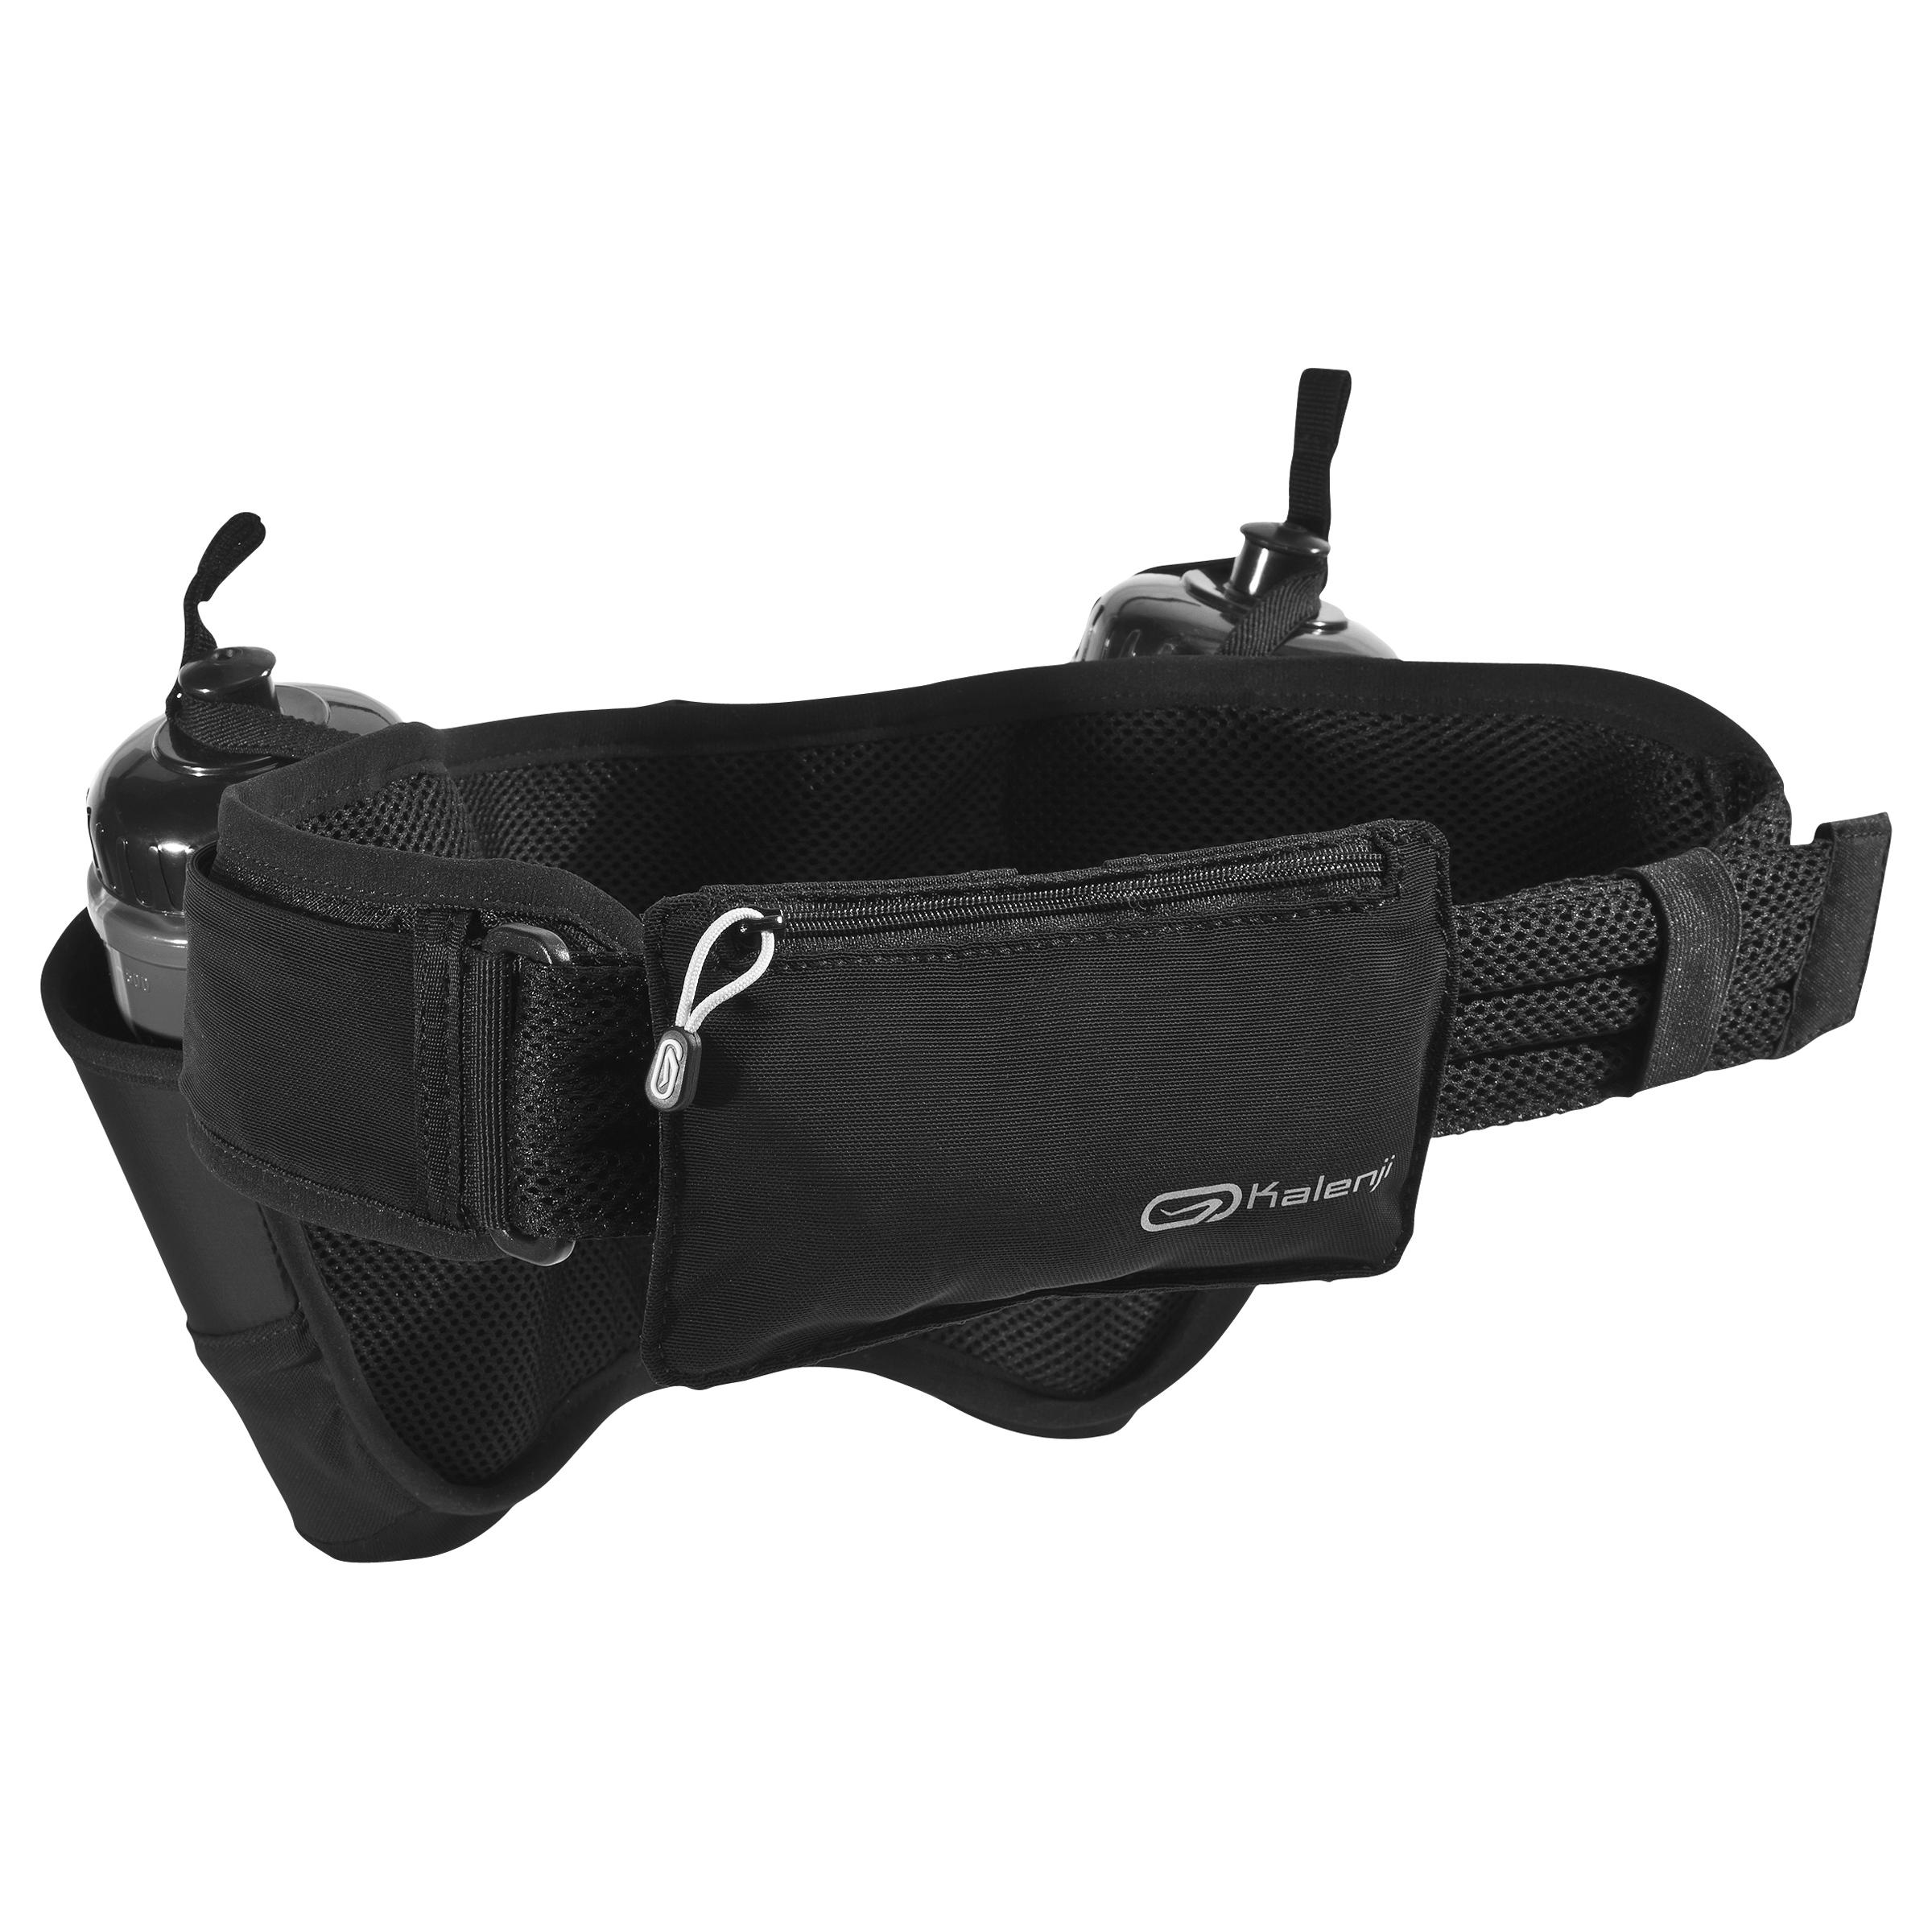 Adaptable Belt Pocket